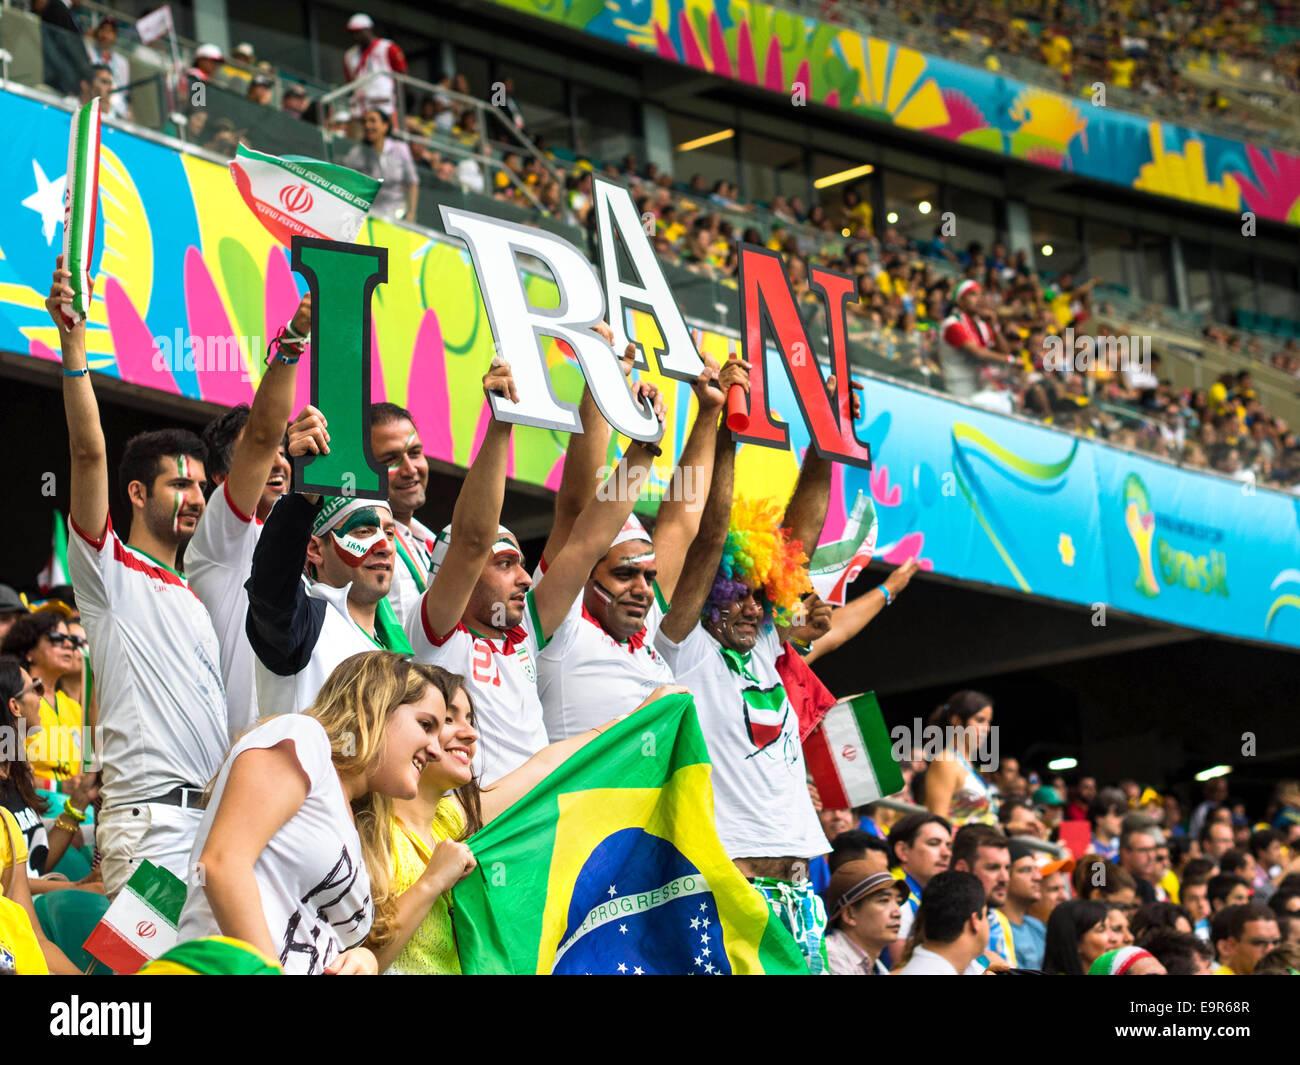 Iran football fans watching FIFA World Cup match against Bosnia and Herzegovina at Fonte Nova stadium, Salvador, - Stock Image